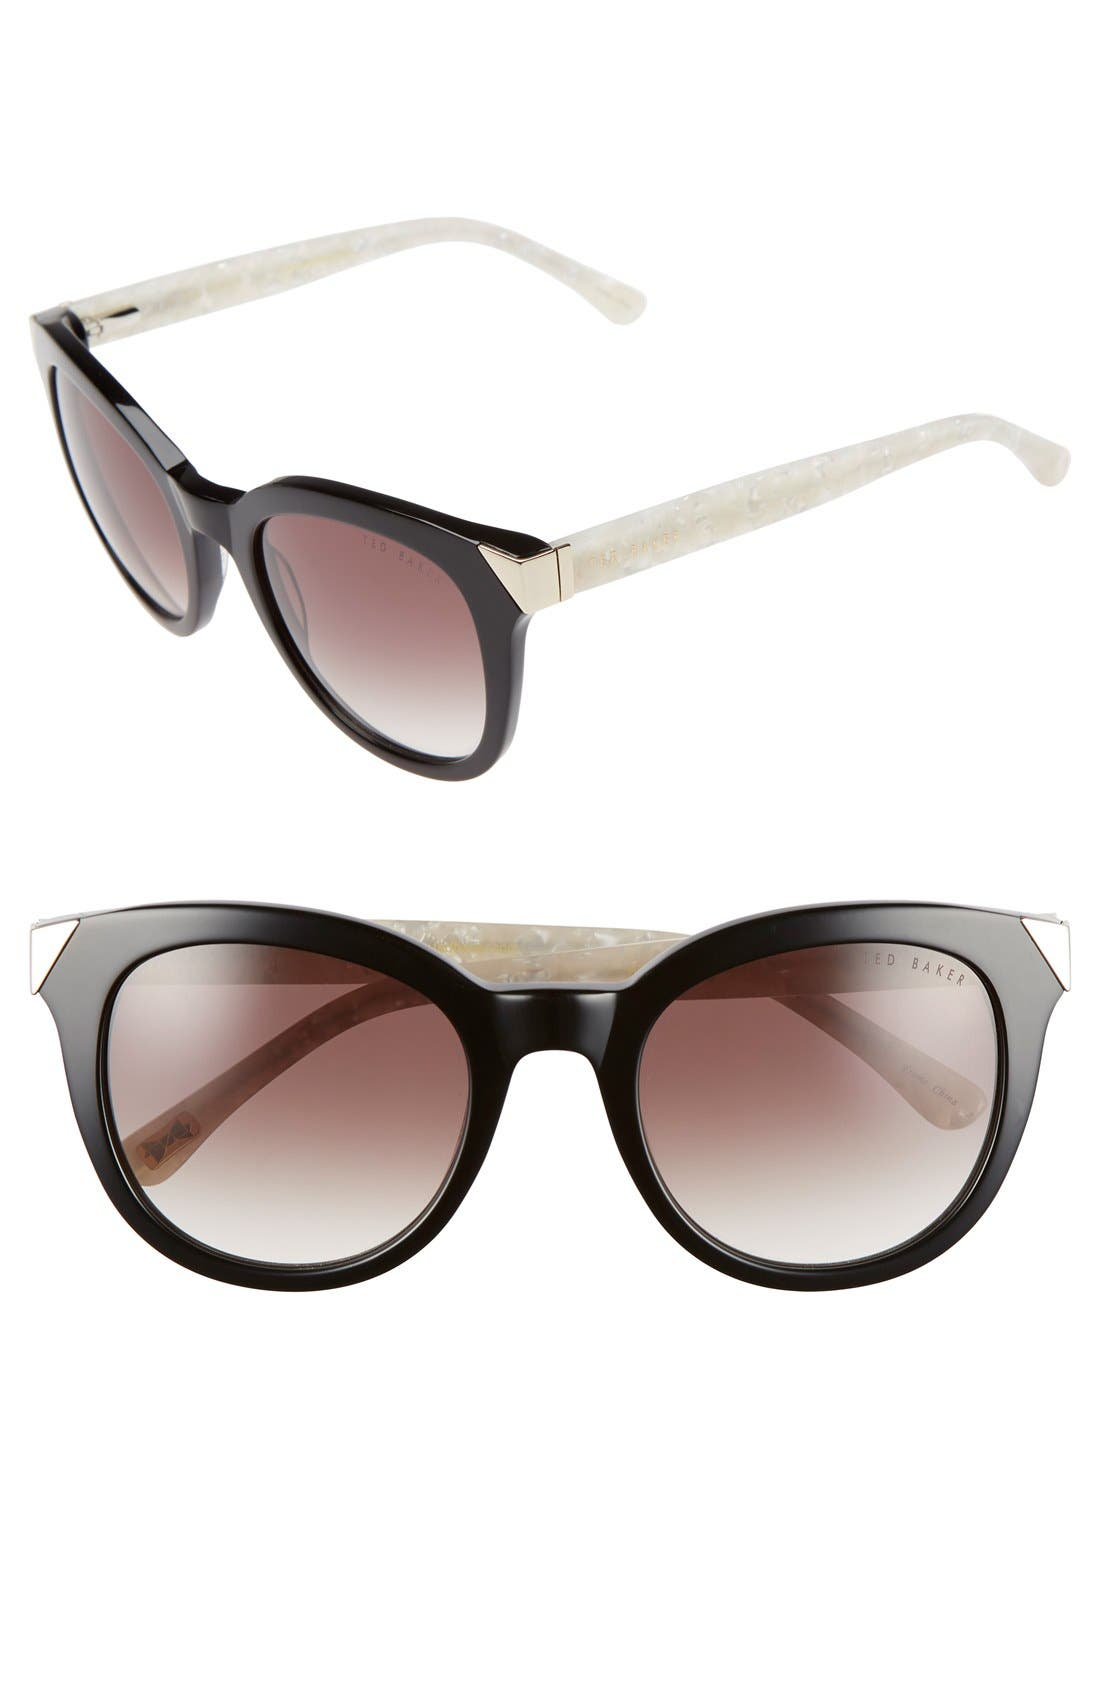 52mm Metal Accent Sunglasses,                         Main,                         color,